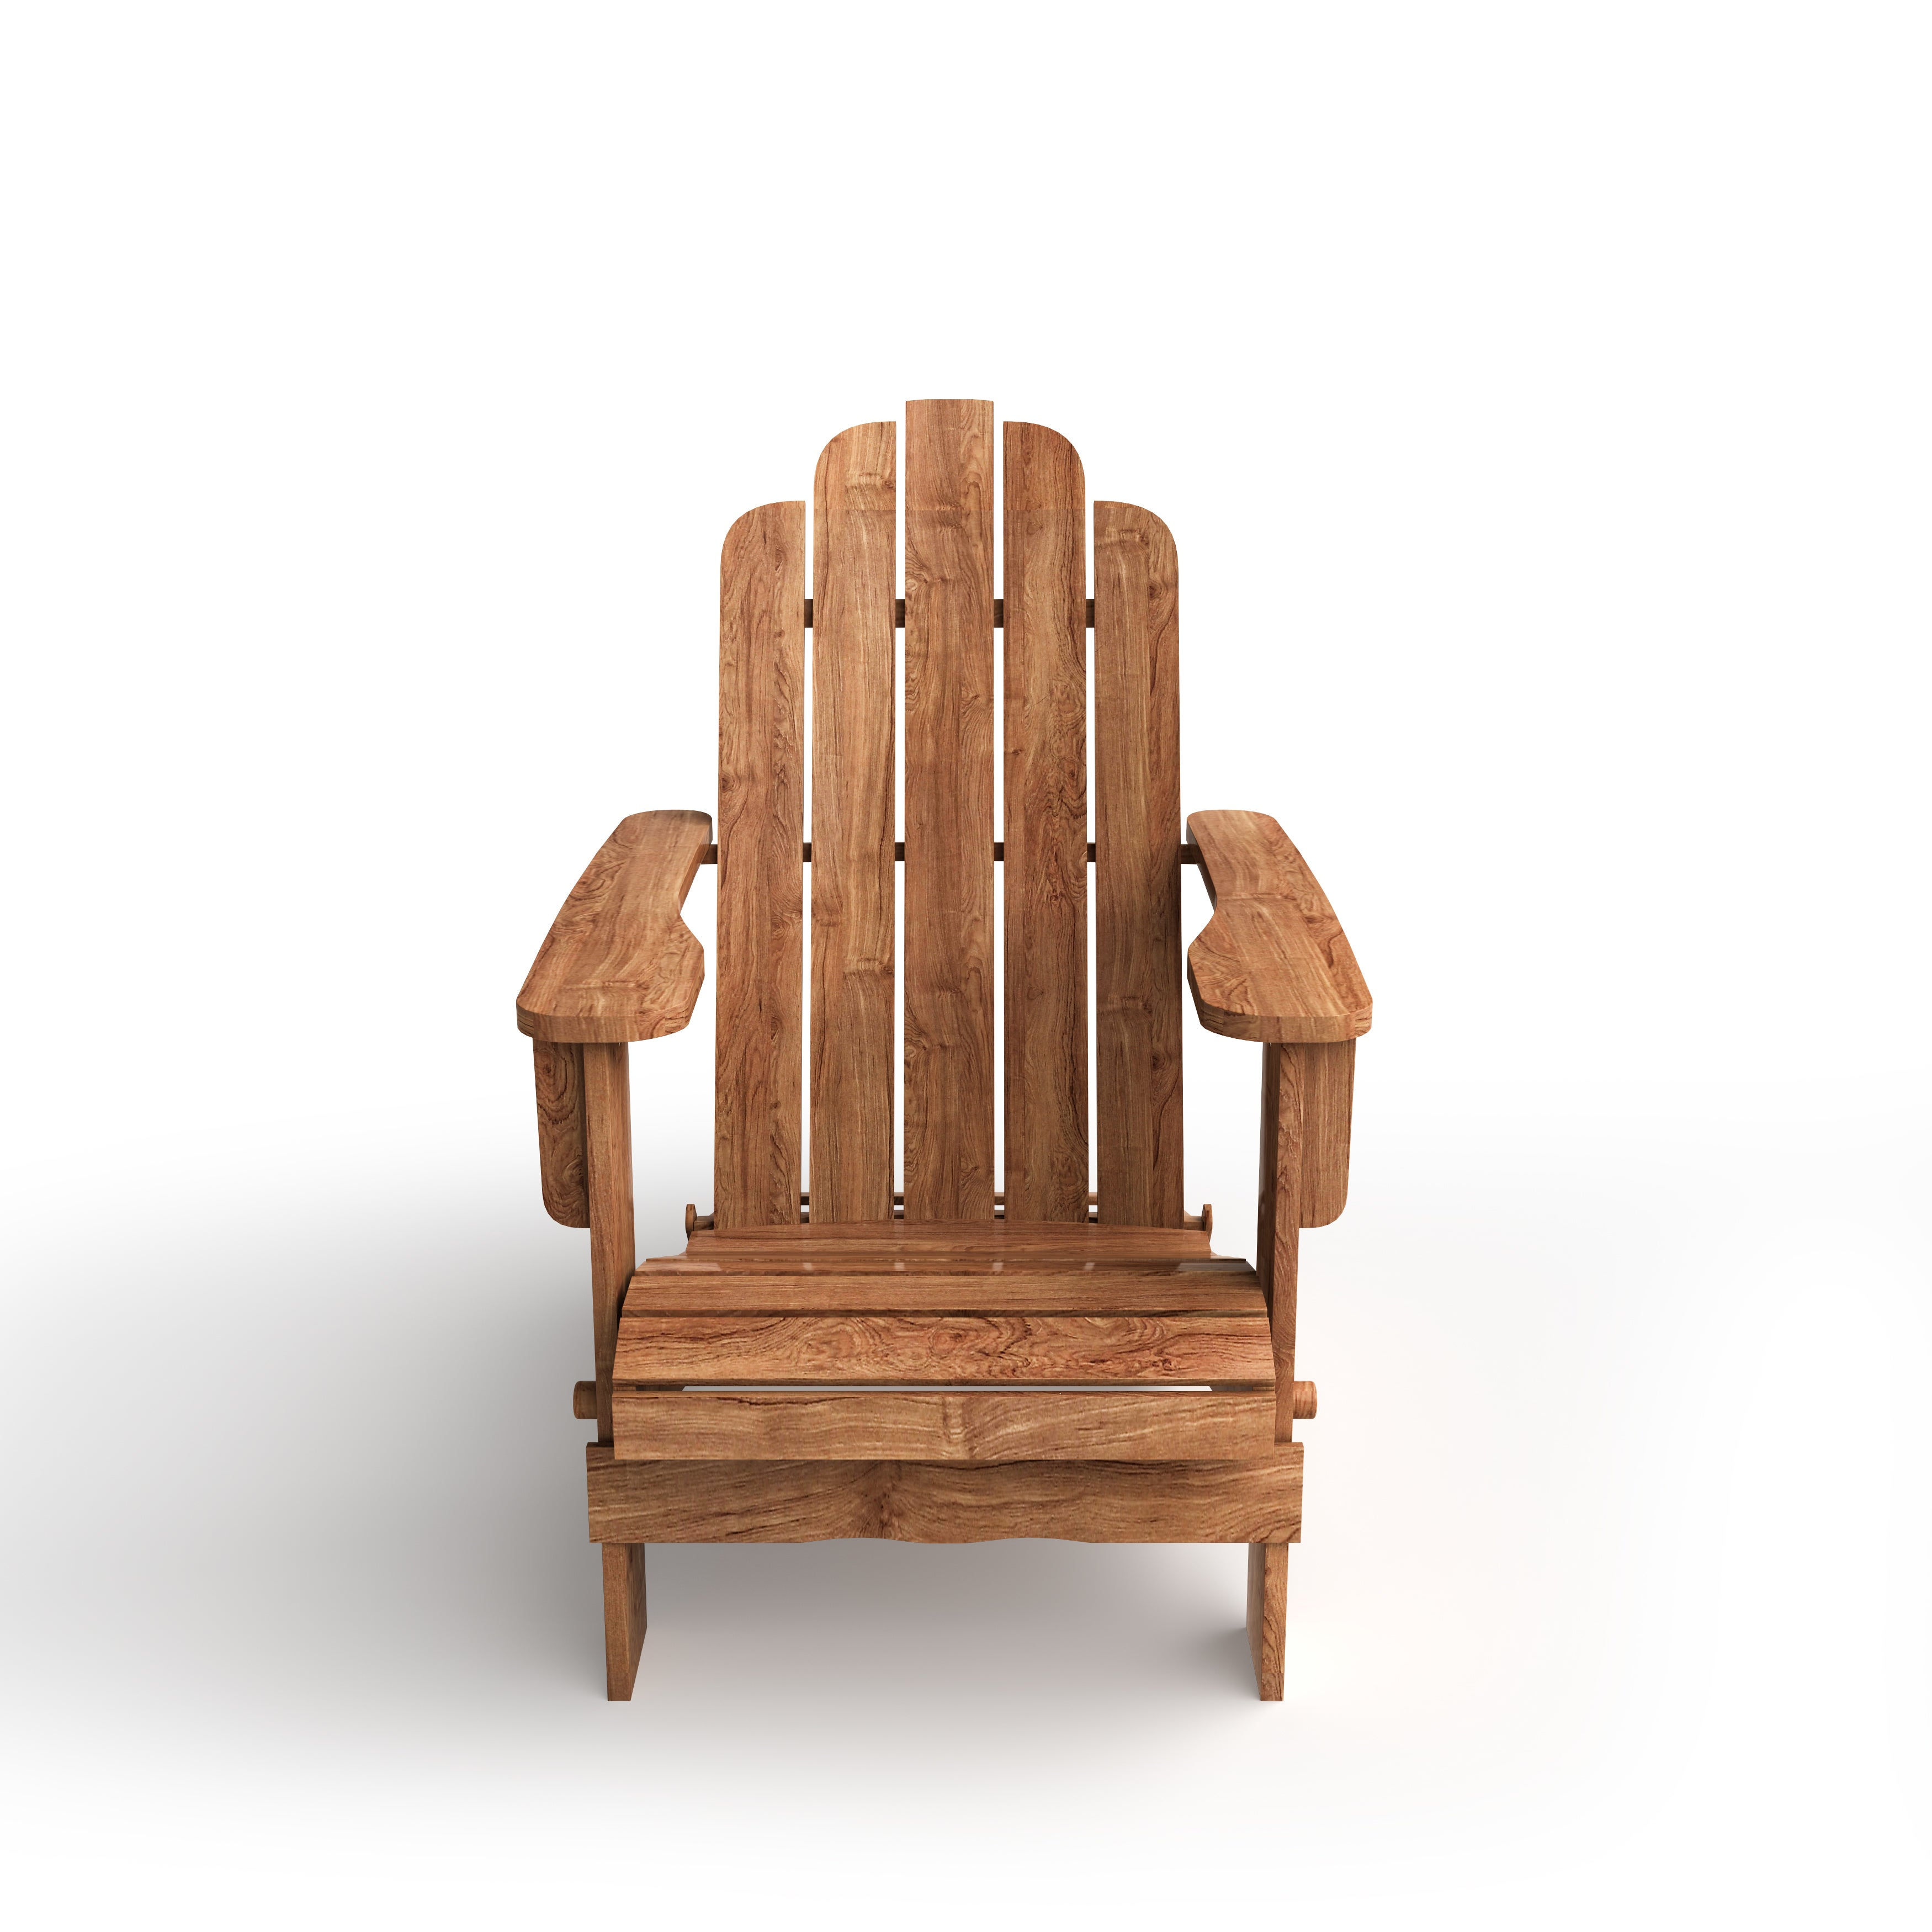 shop the gray barn bluebird acacia adirondack patio chair brown on sale free shipping today overstockcom 20881995 - Patio Chair